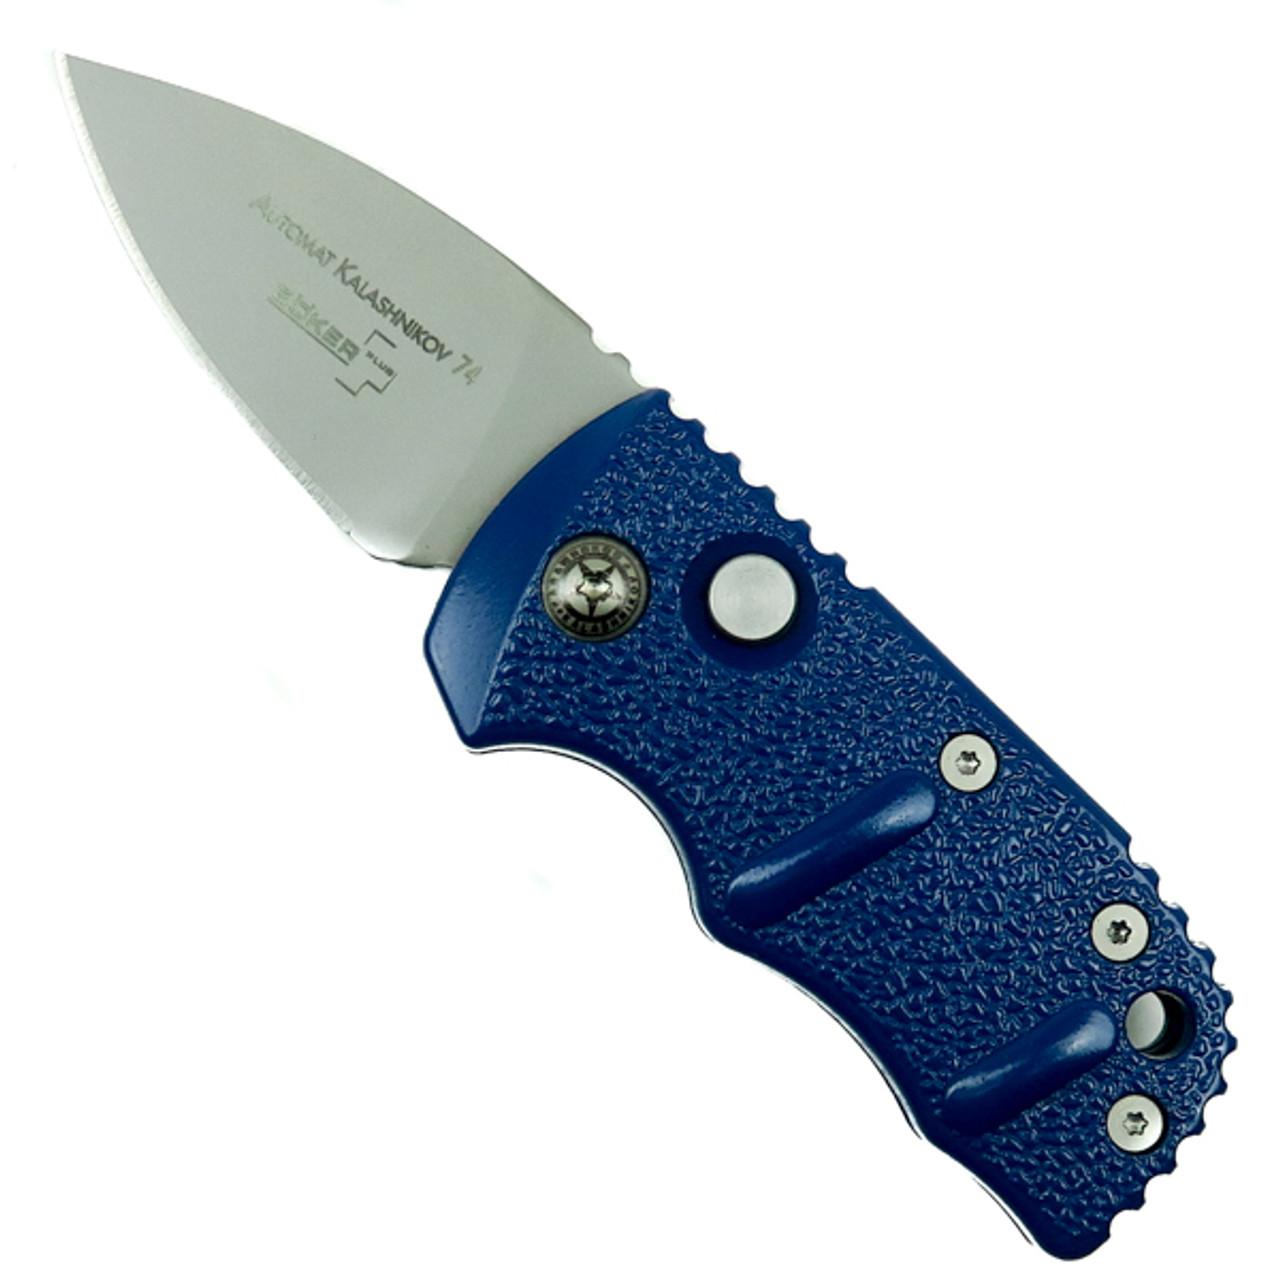 "Boker Blue Sub Kalashnikov Auto Knife, 1.95"" Blade [Exclusive]"